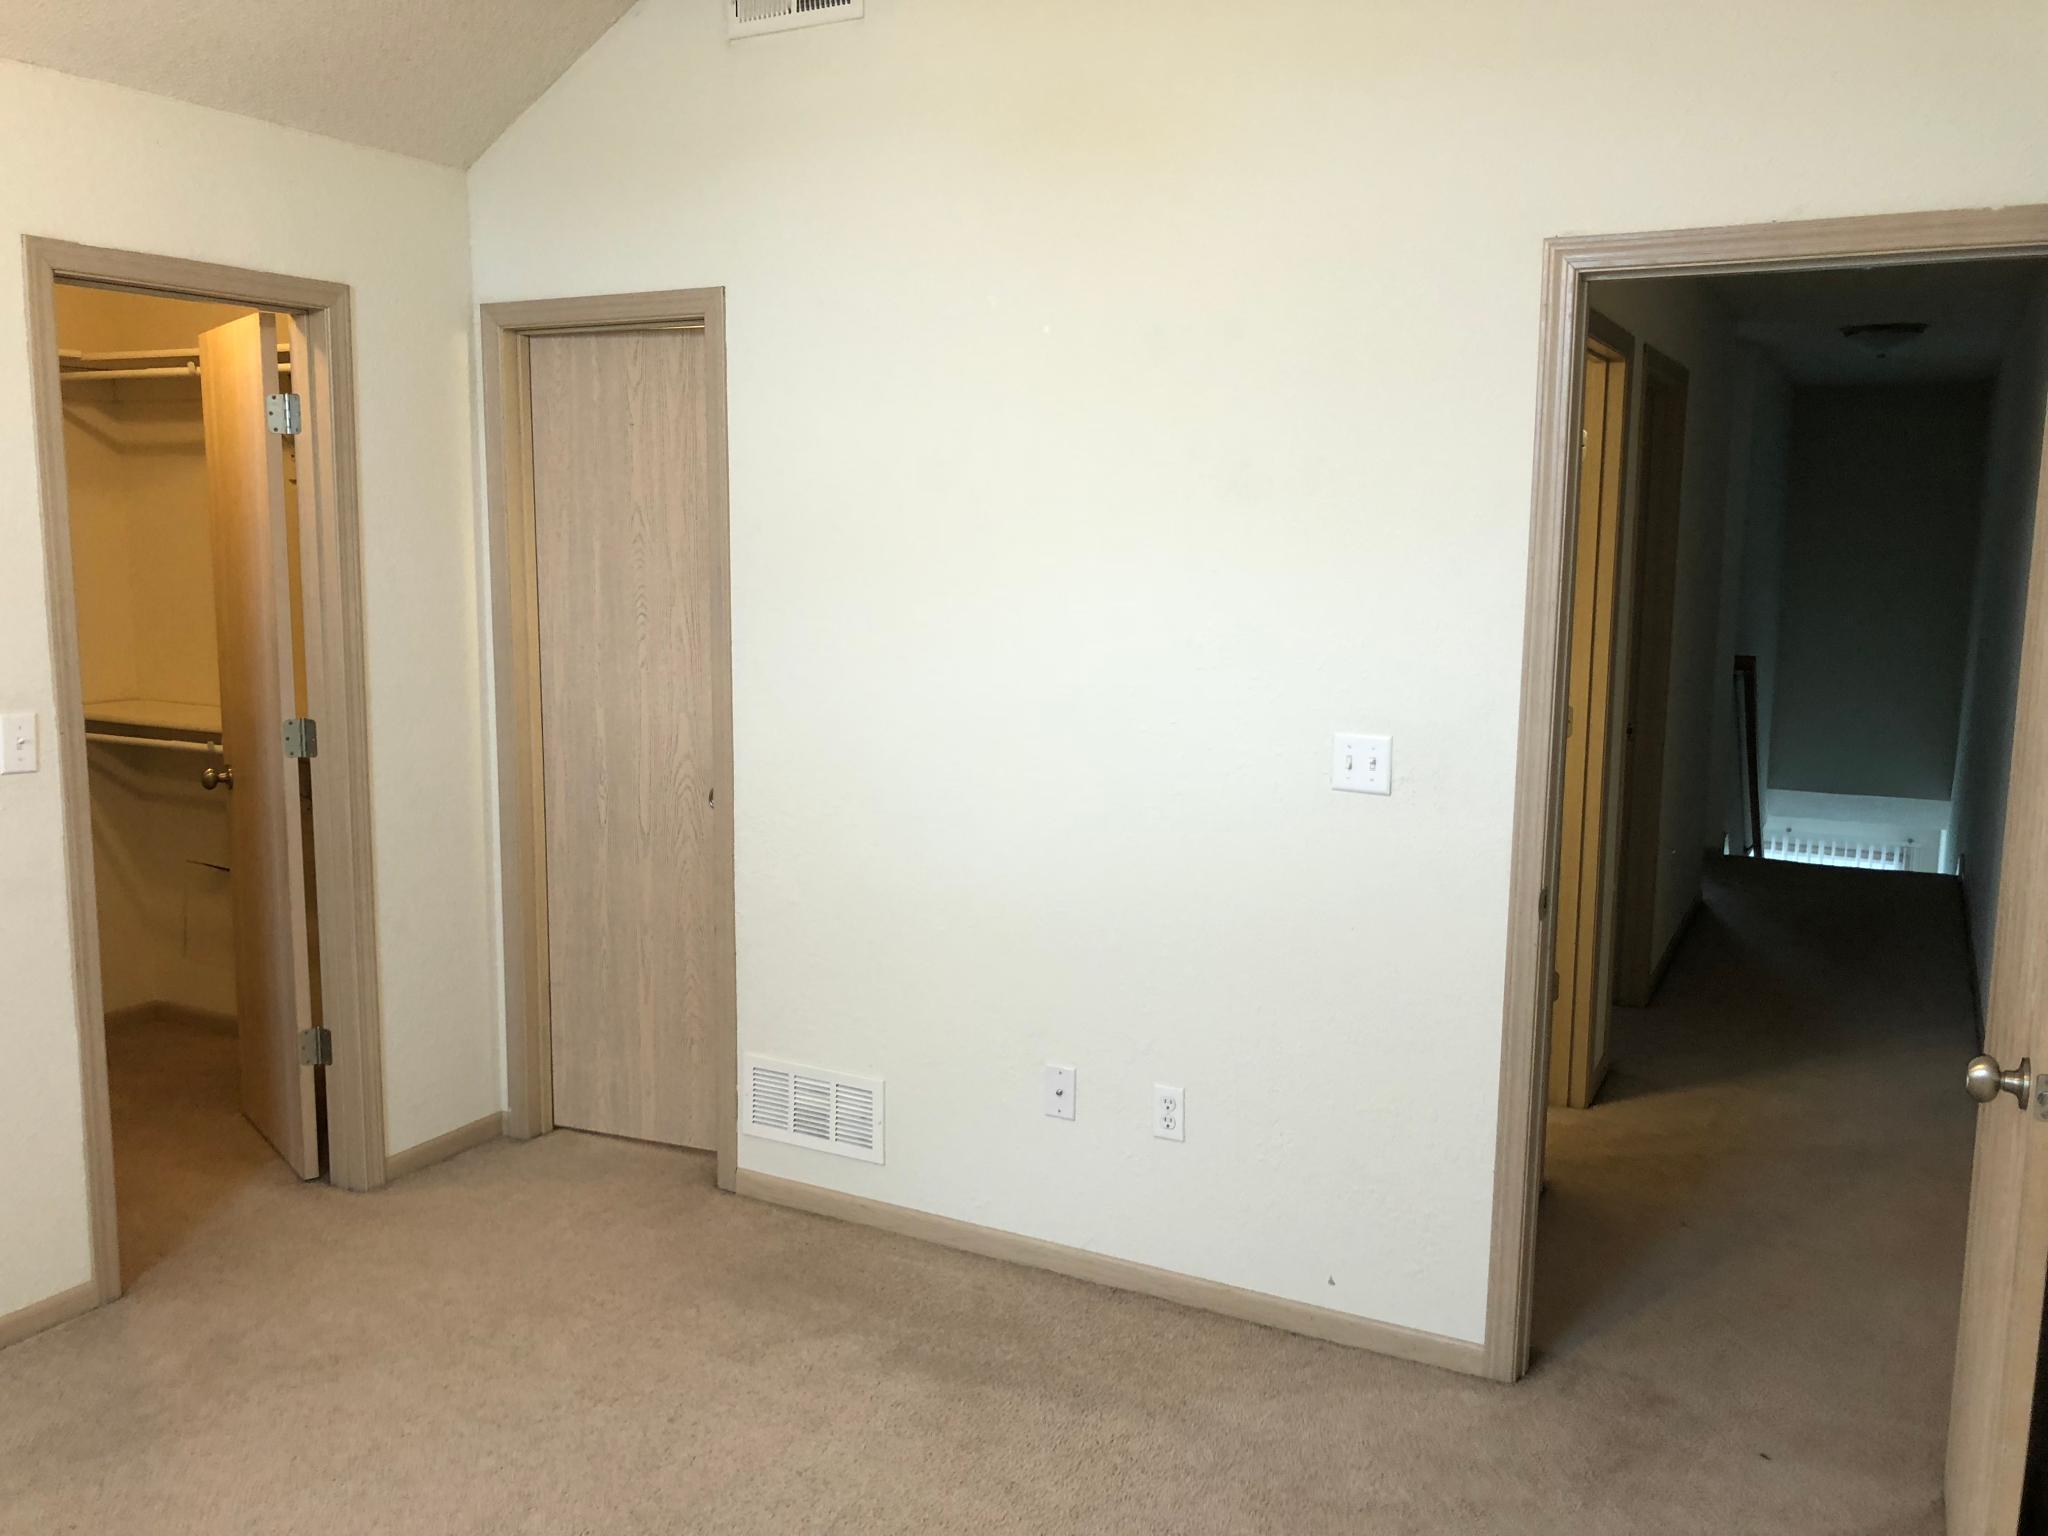 4600 Willow Ave, Kansas City, MO 64133 For Rent | Trulia